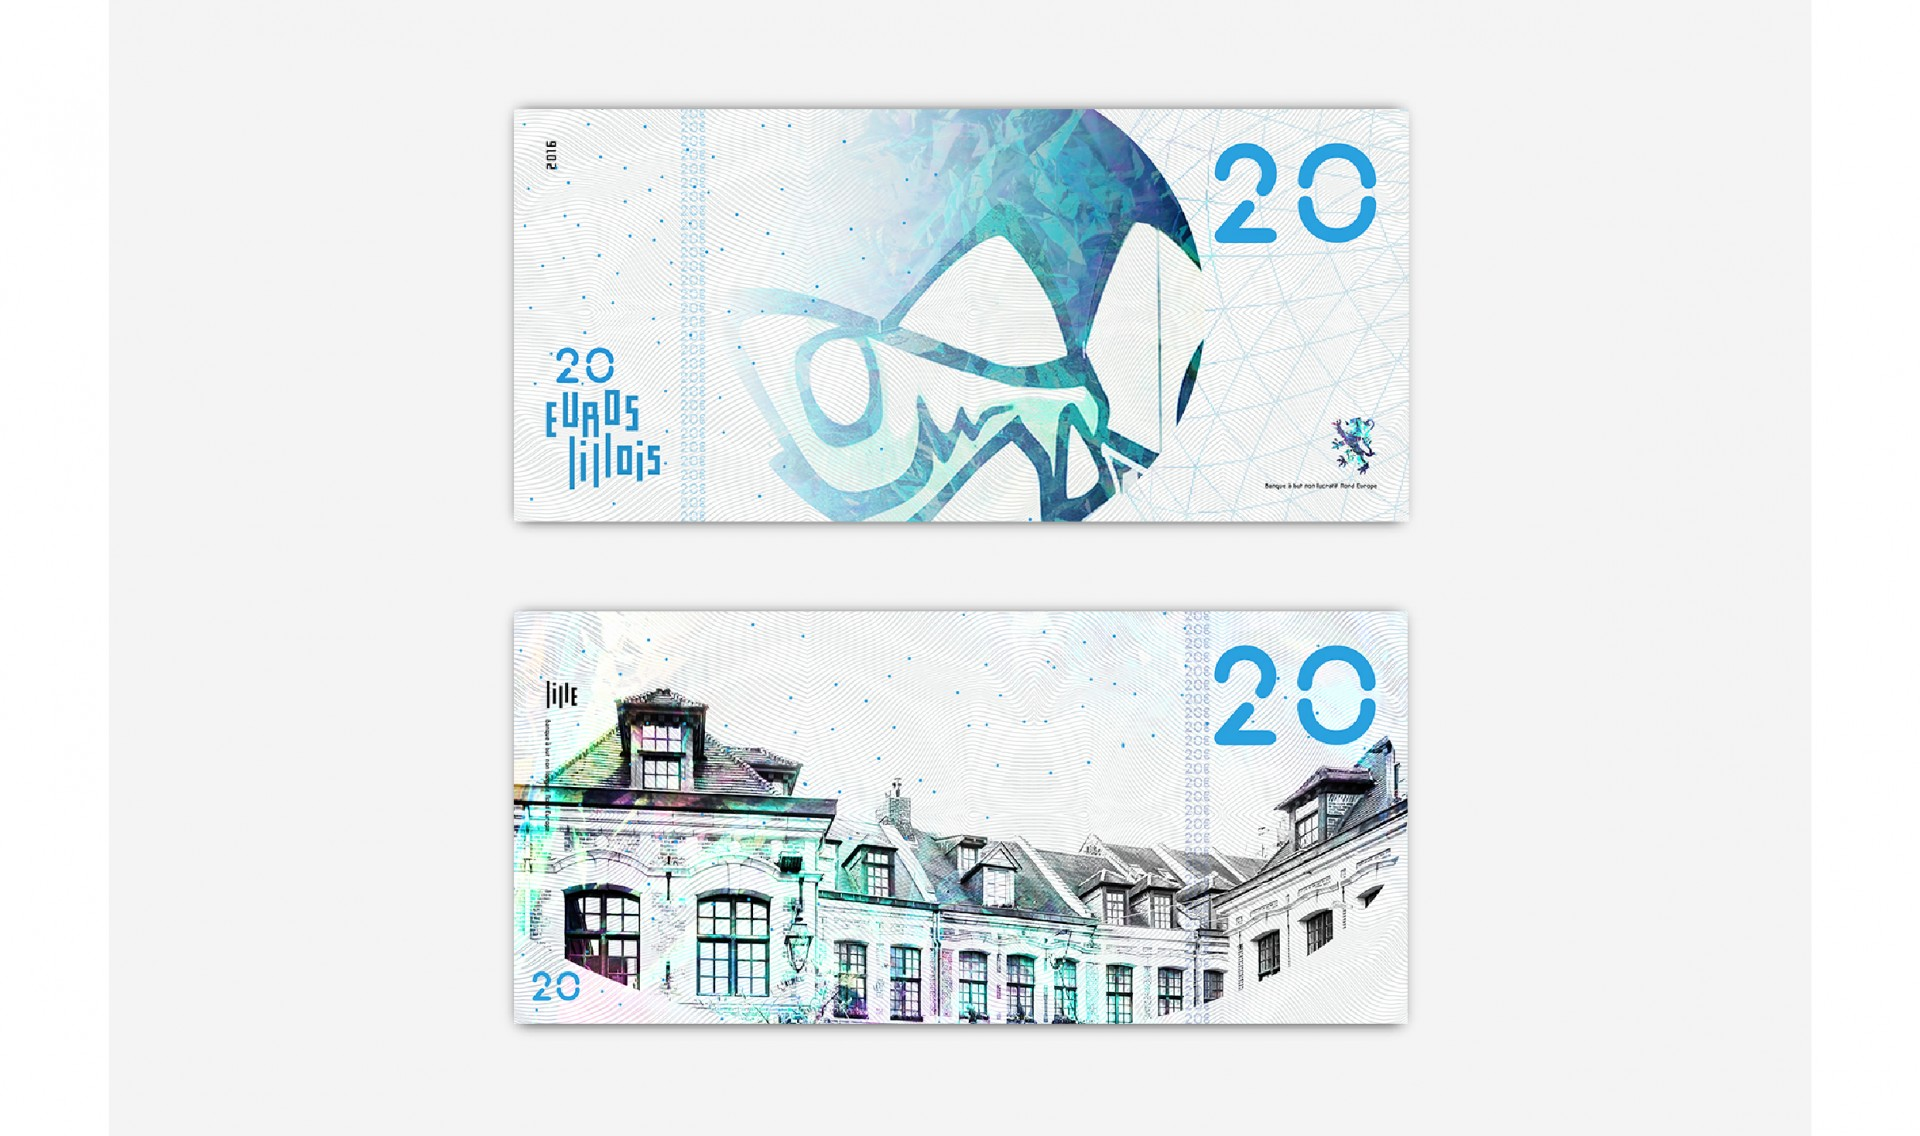 Édouard Spriet EUROS LILLOIS | BRANDING